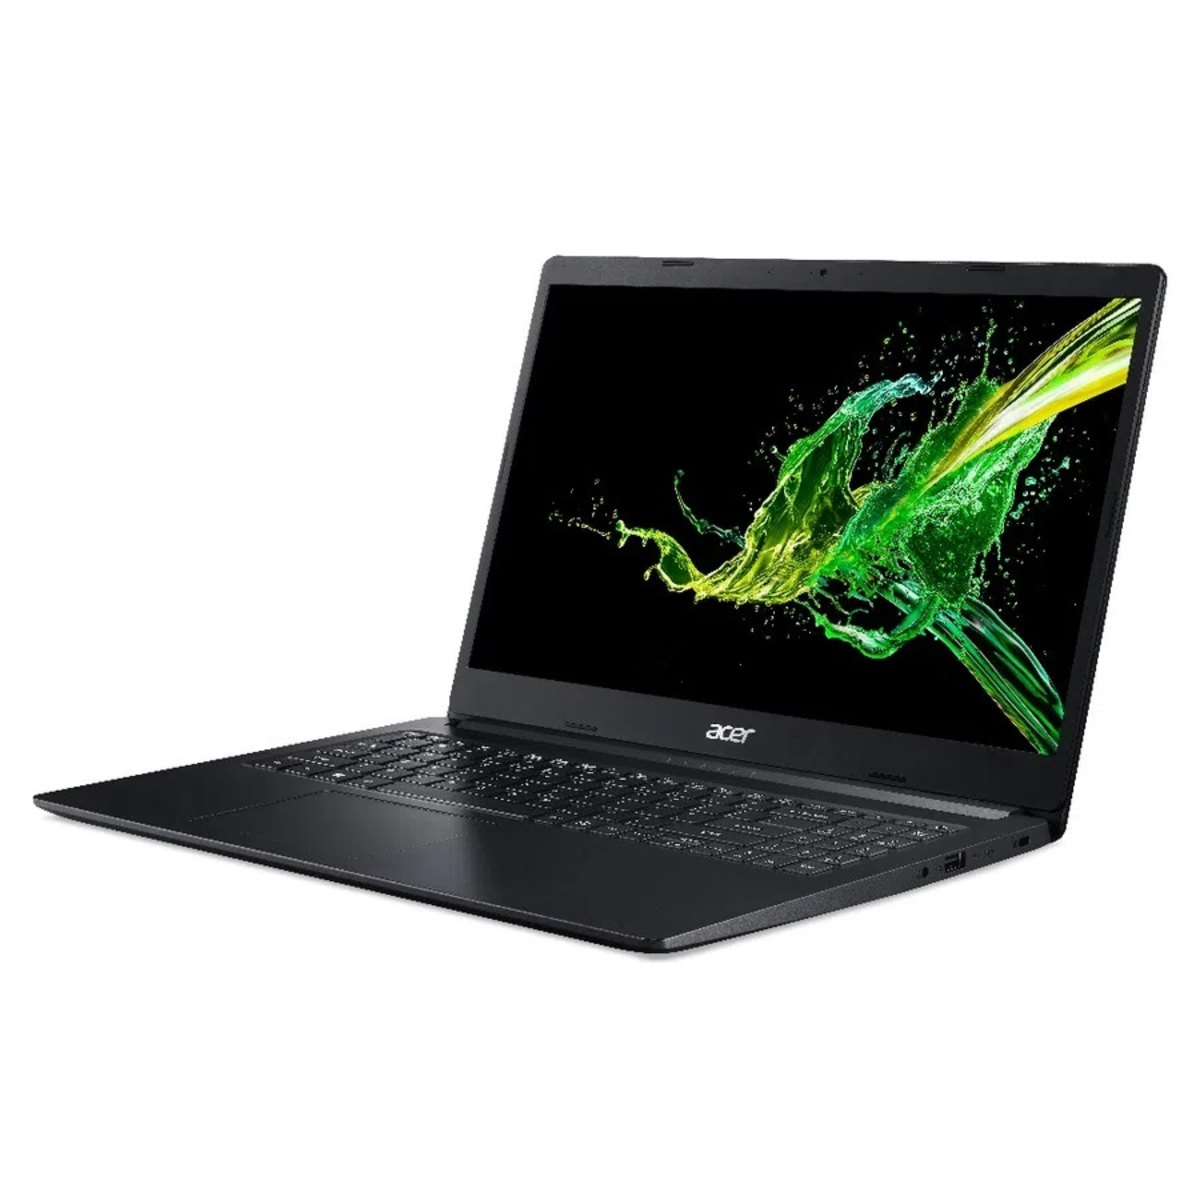 Notebook Acer A315 Intel Celeron N4000 Memoria 4gb Hd 1tb Tela 15.6' Hd Windows 10 Pro